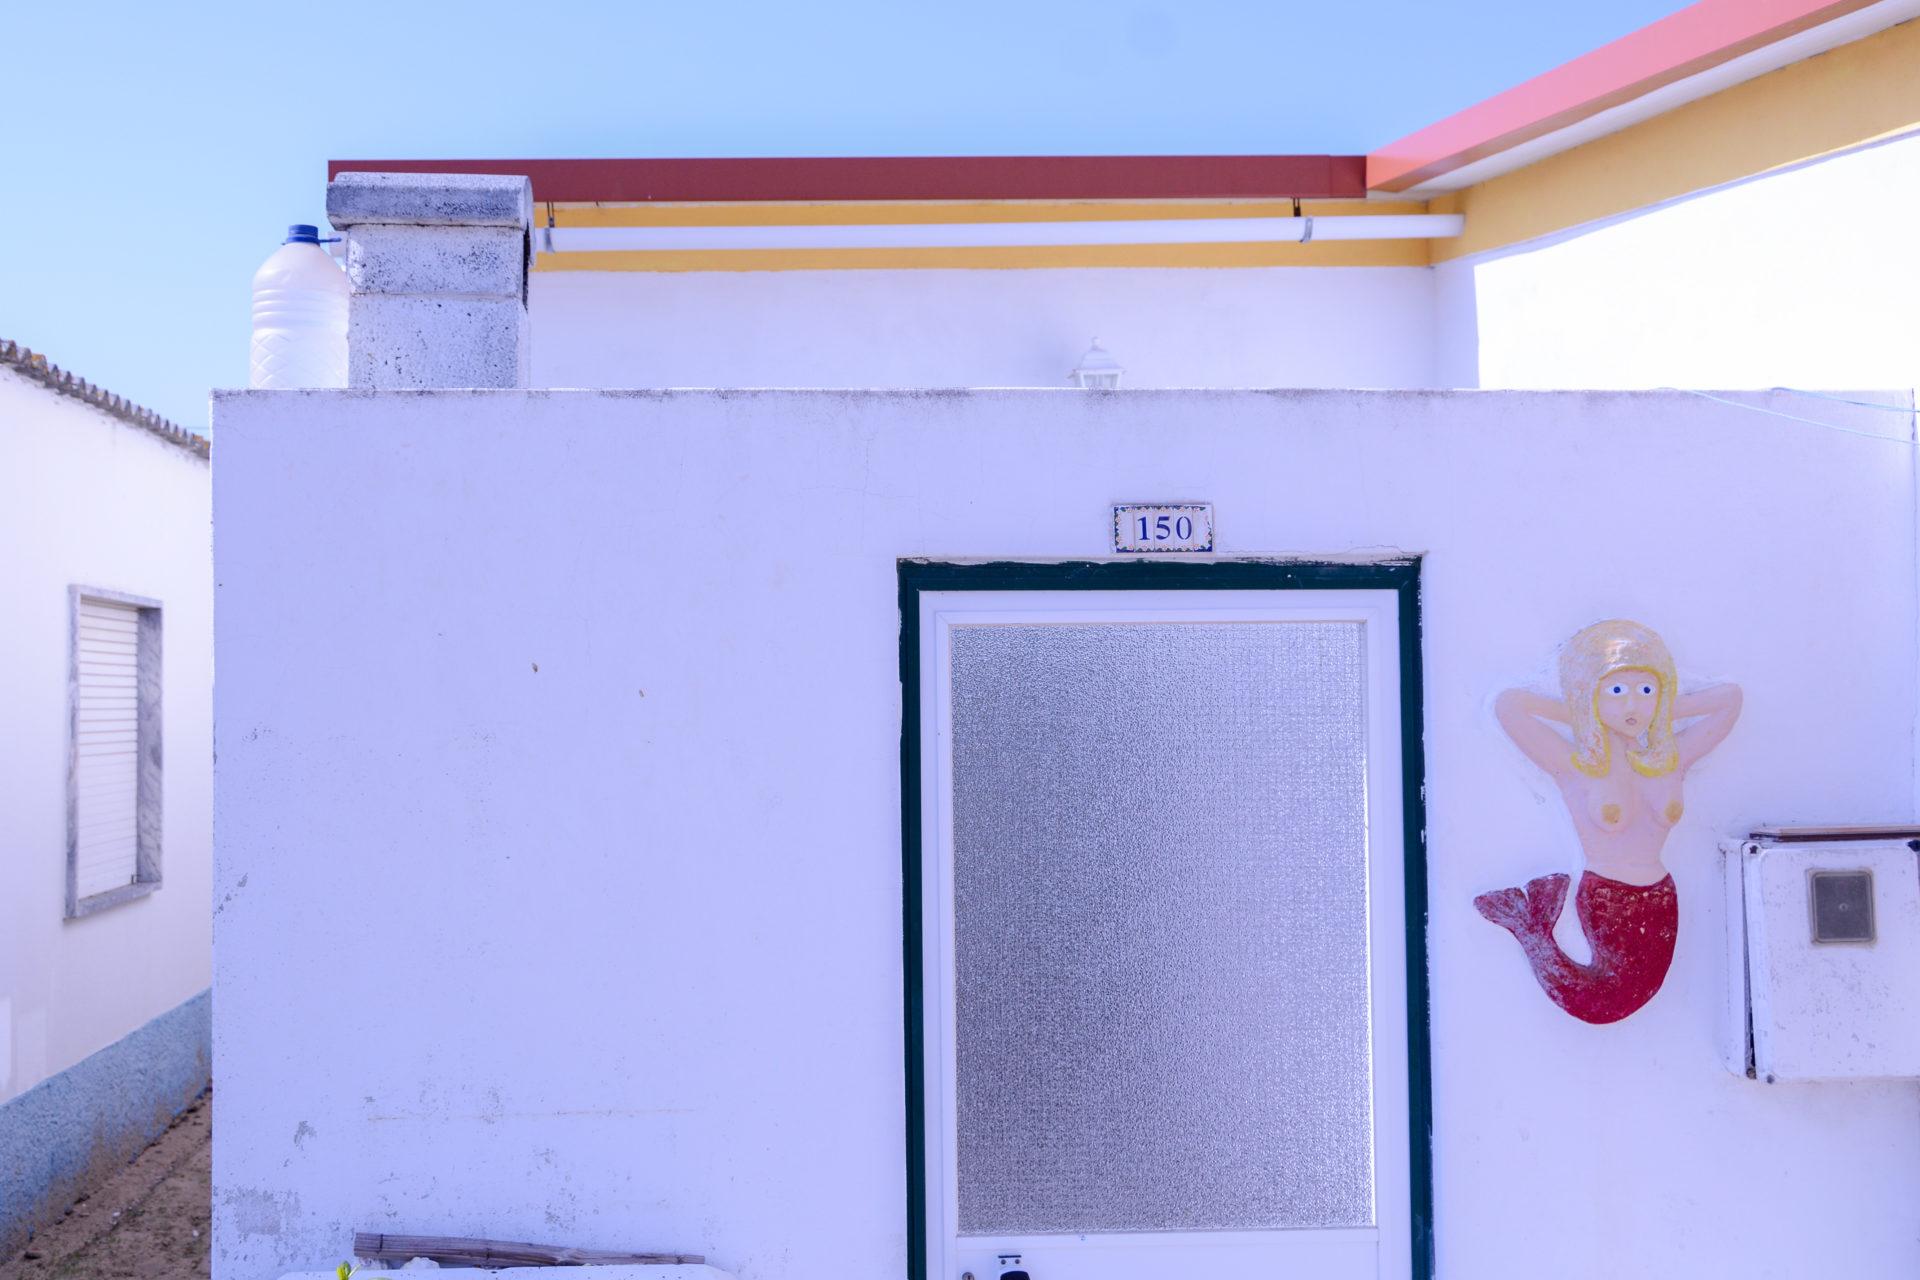 Hauseingang mit Meerjungfrau auf der Ilha da Culatra